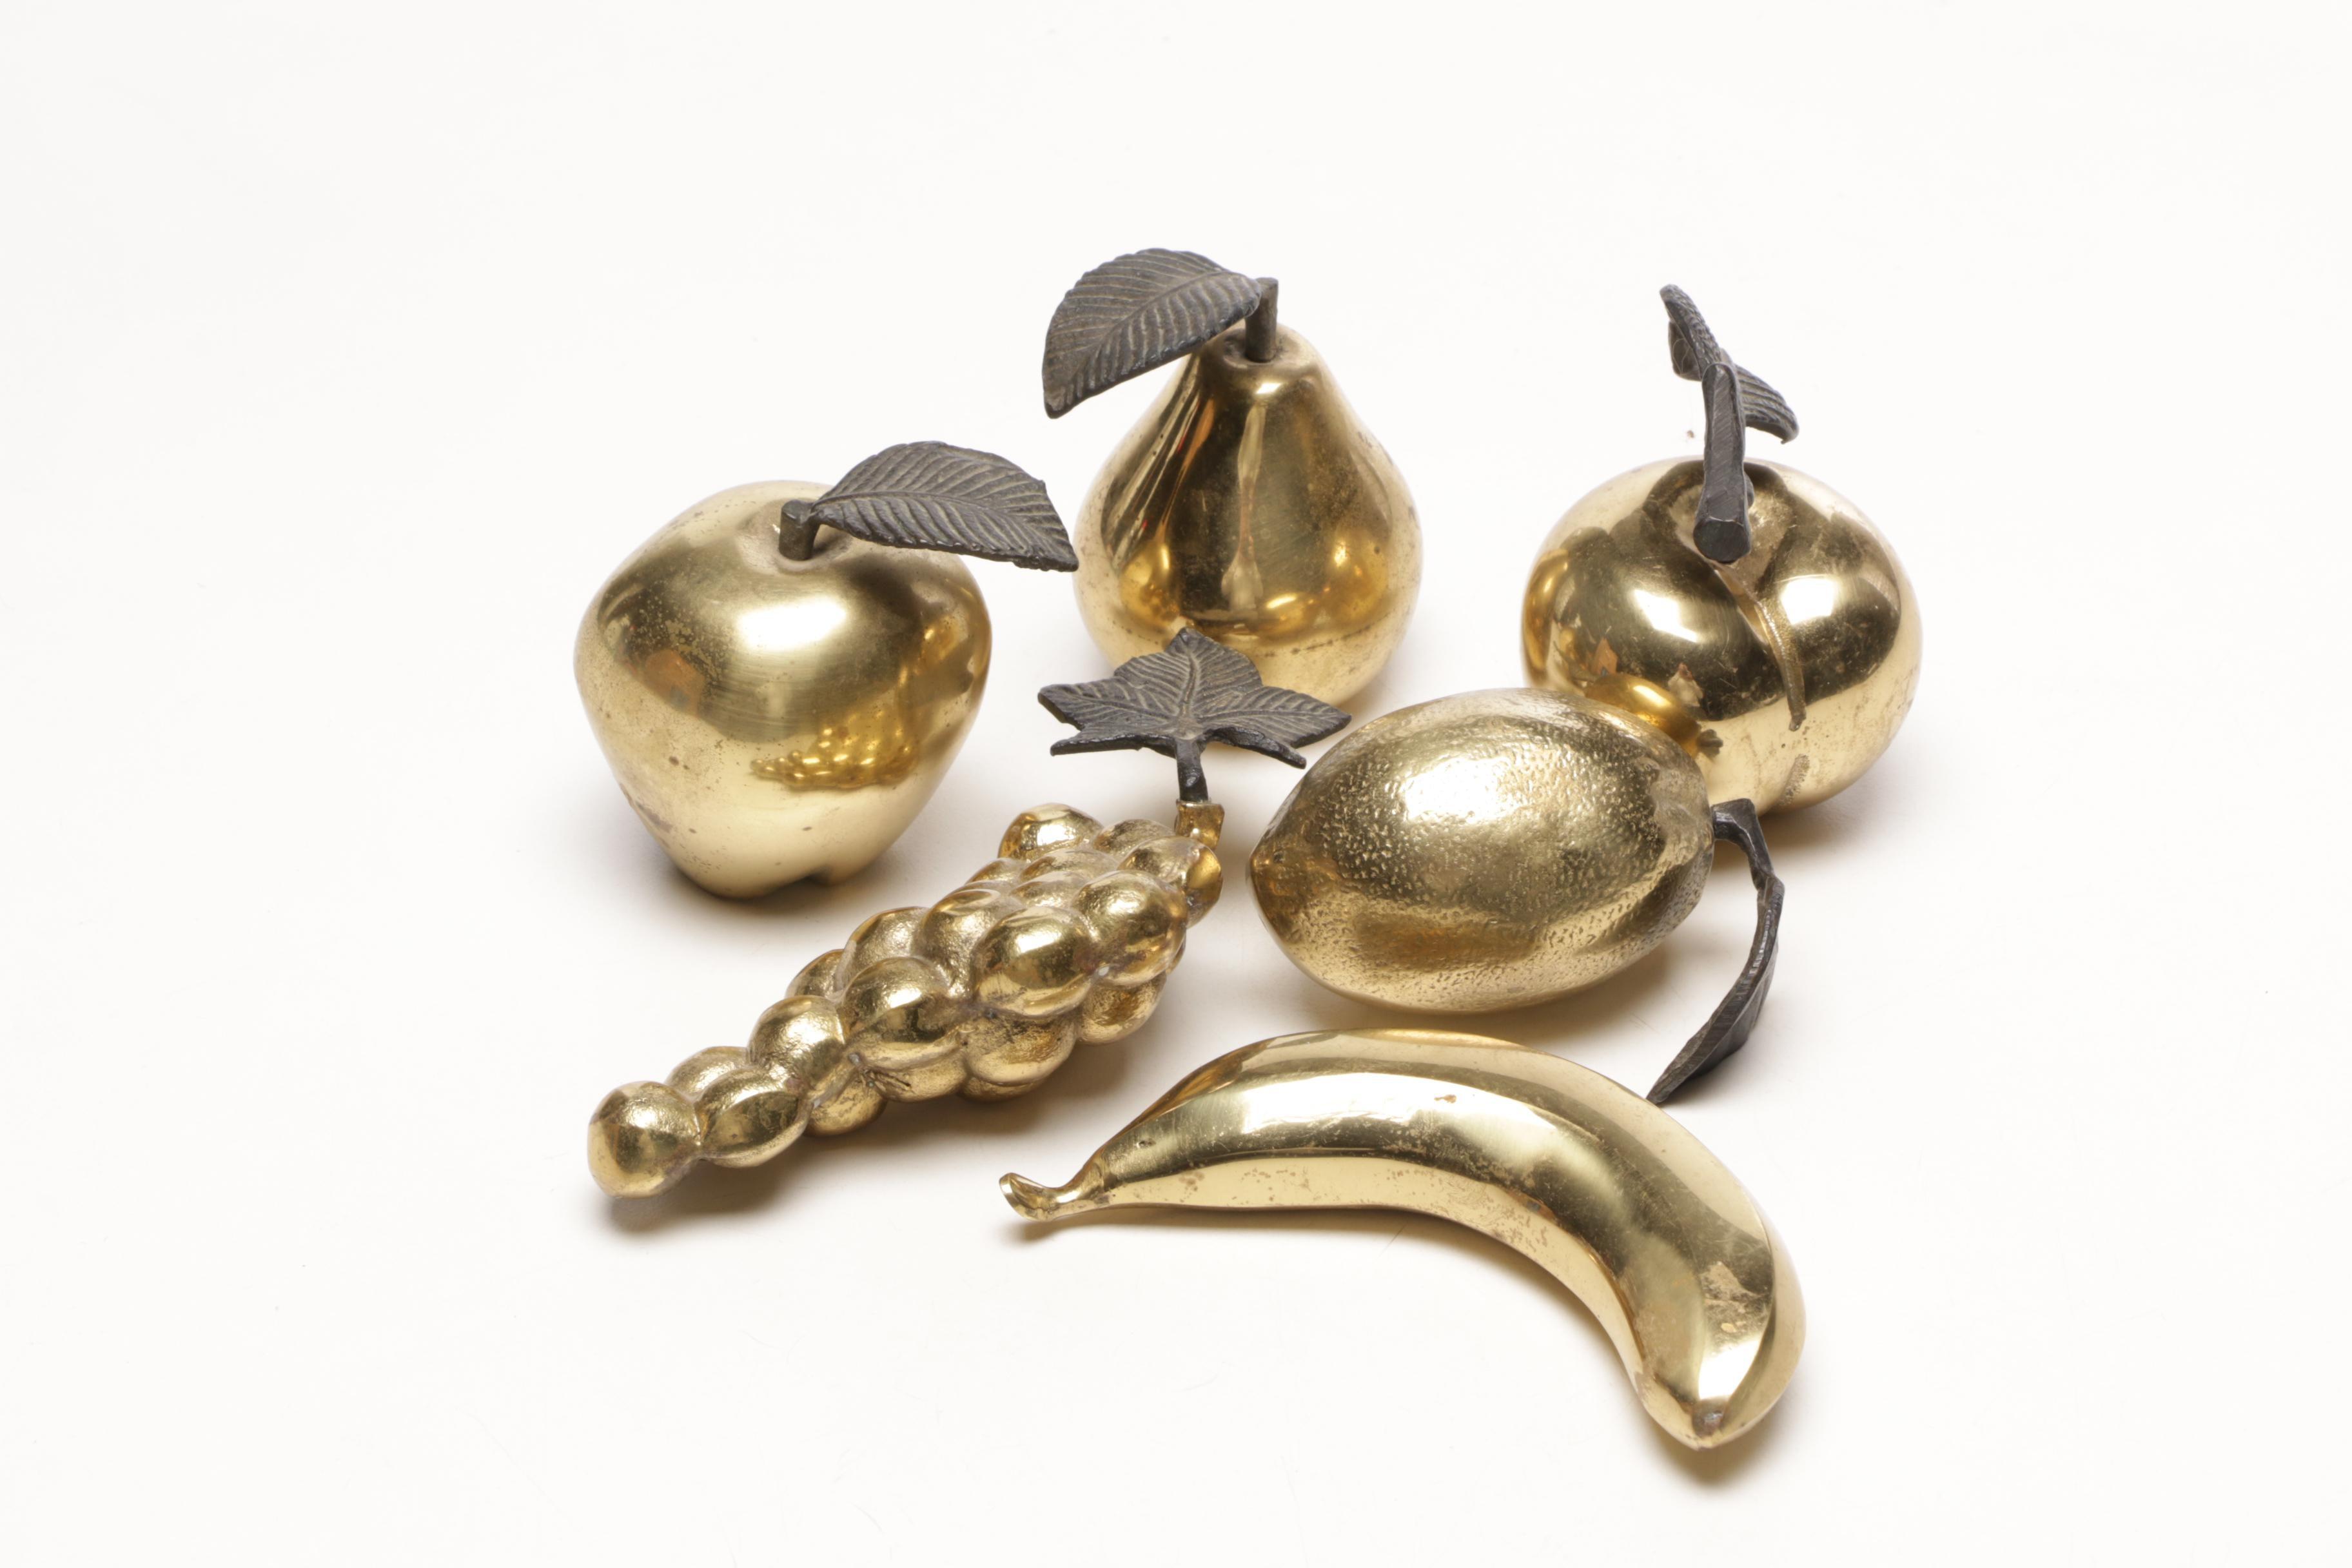 Group of Decorative Brass Fruit